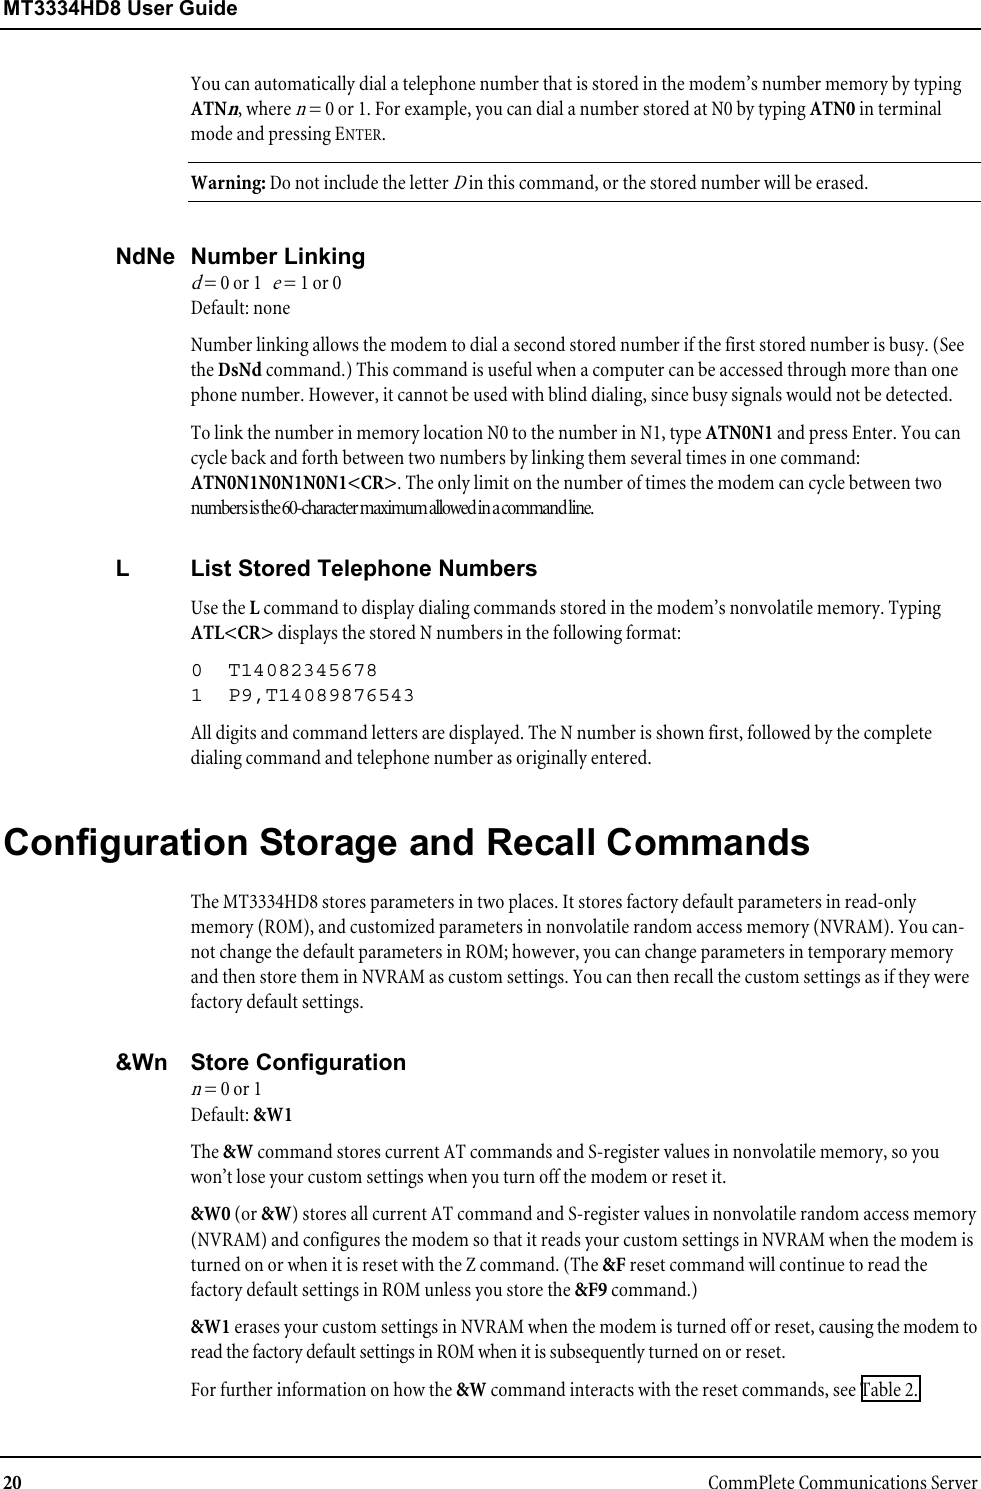 Multi Tech Systems Mt3334Hd8 Users Manual